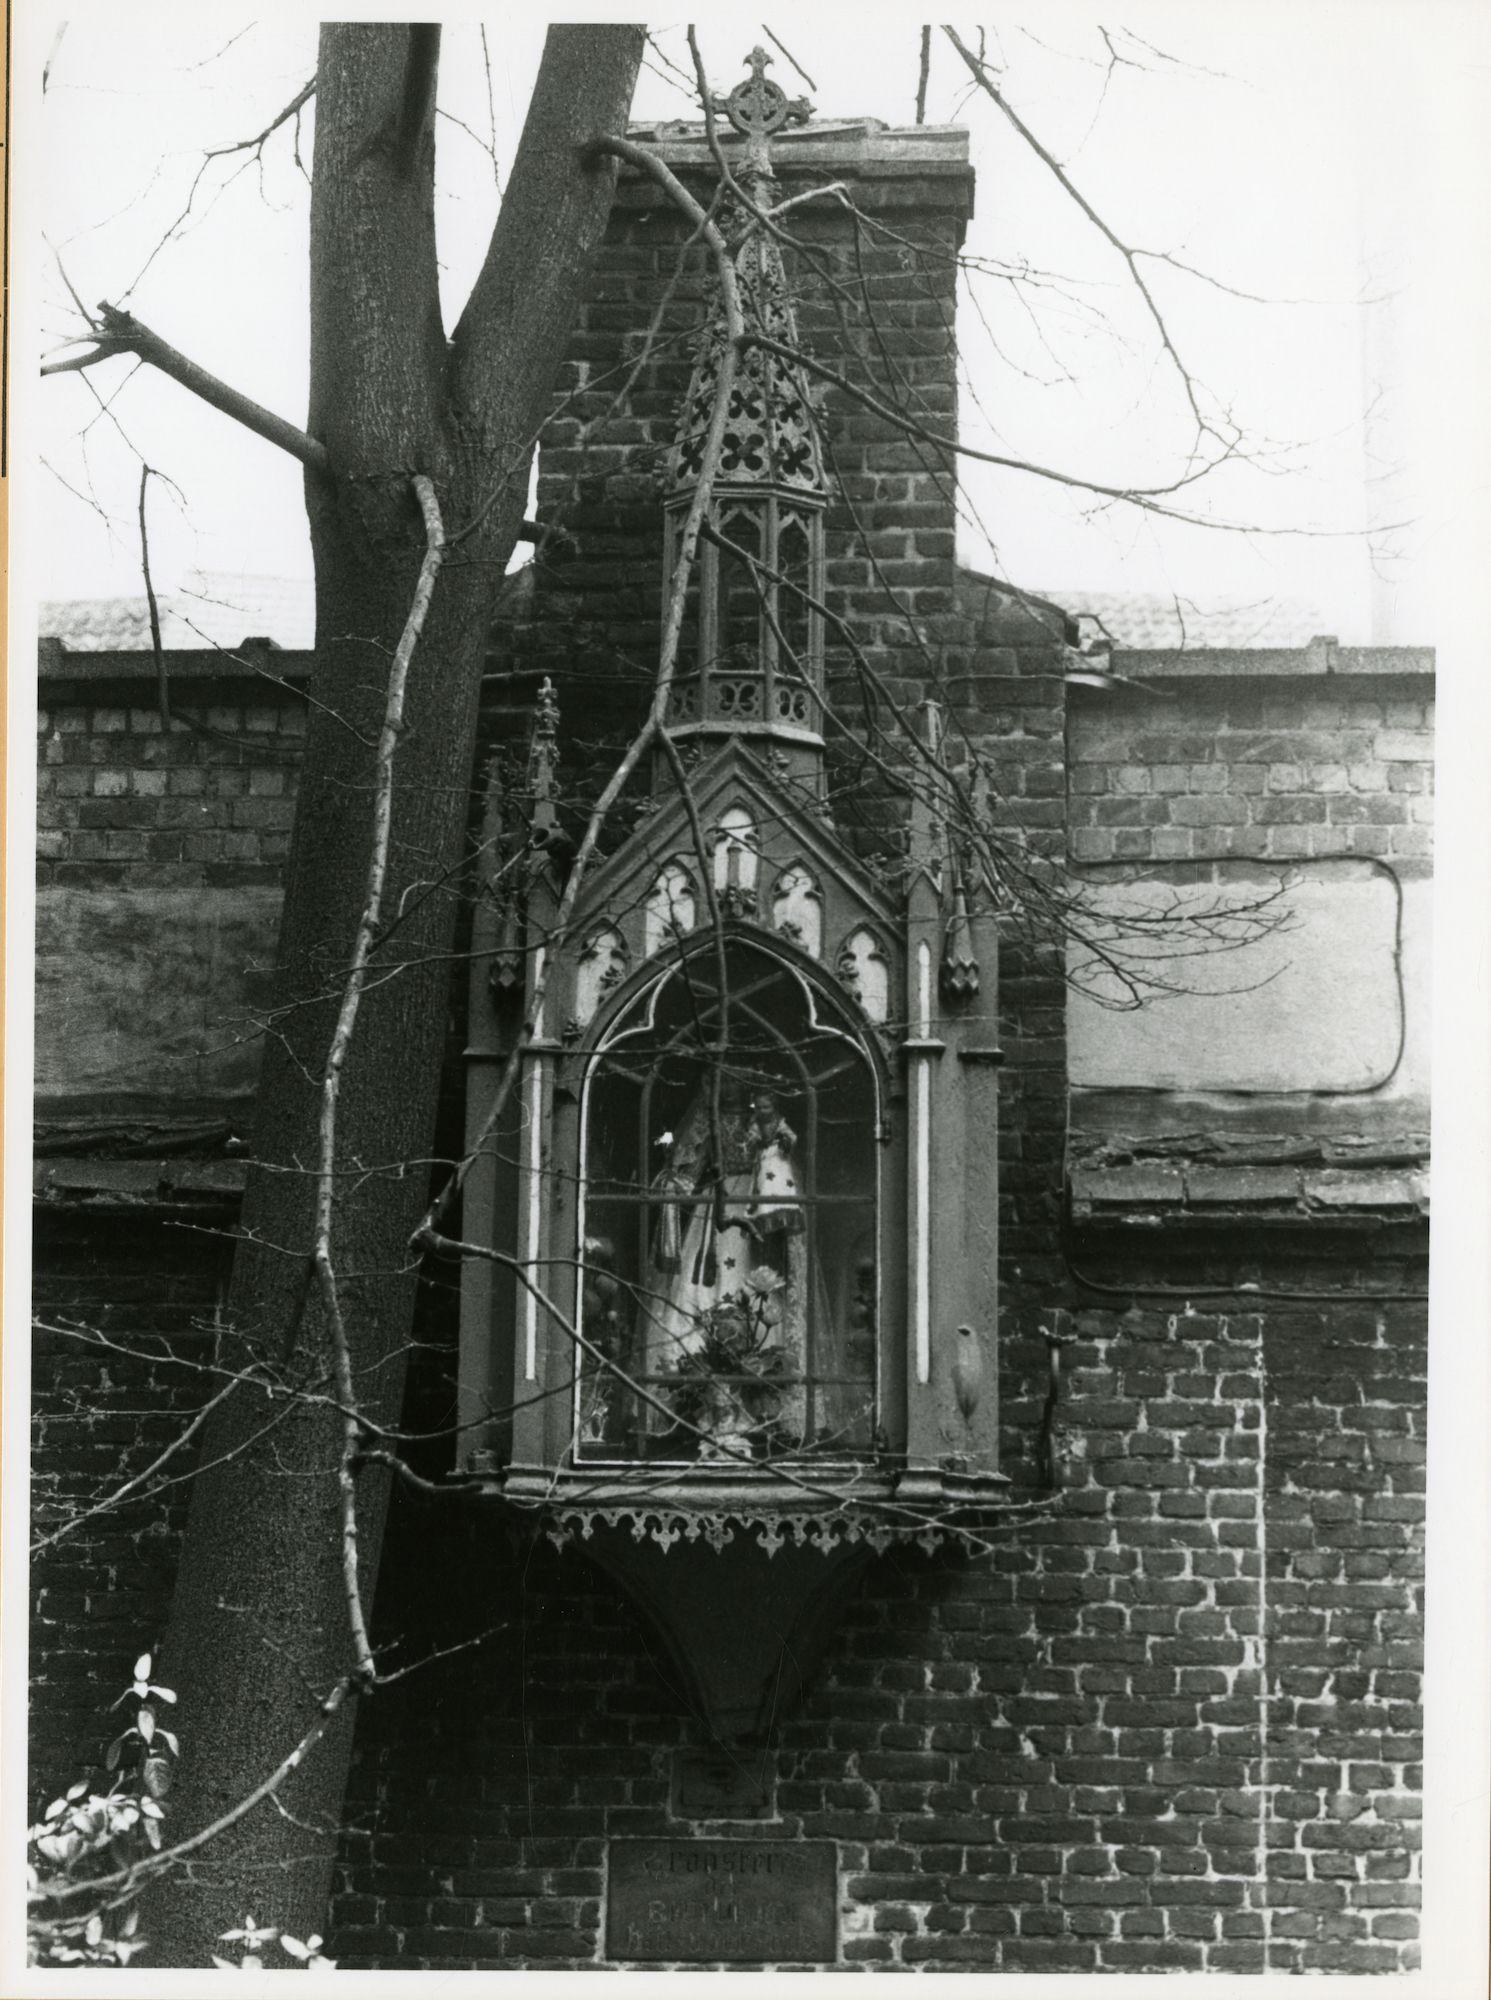 Gent: Keizervest 5: Gevelkapel, 1979